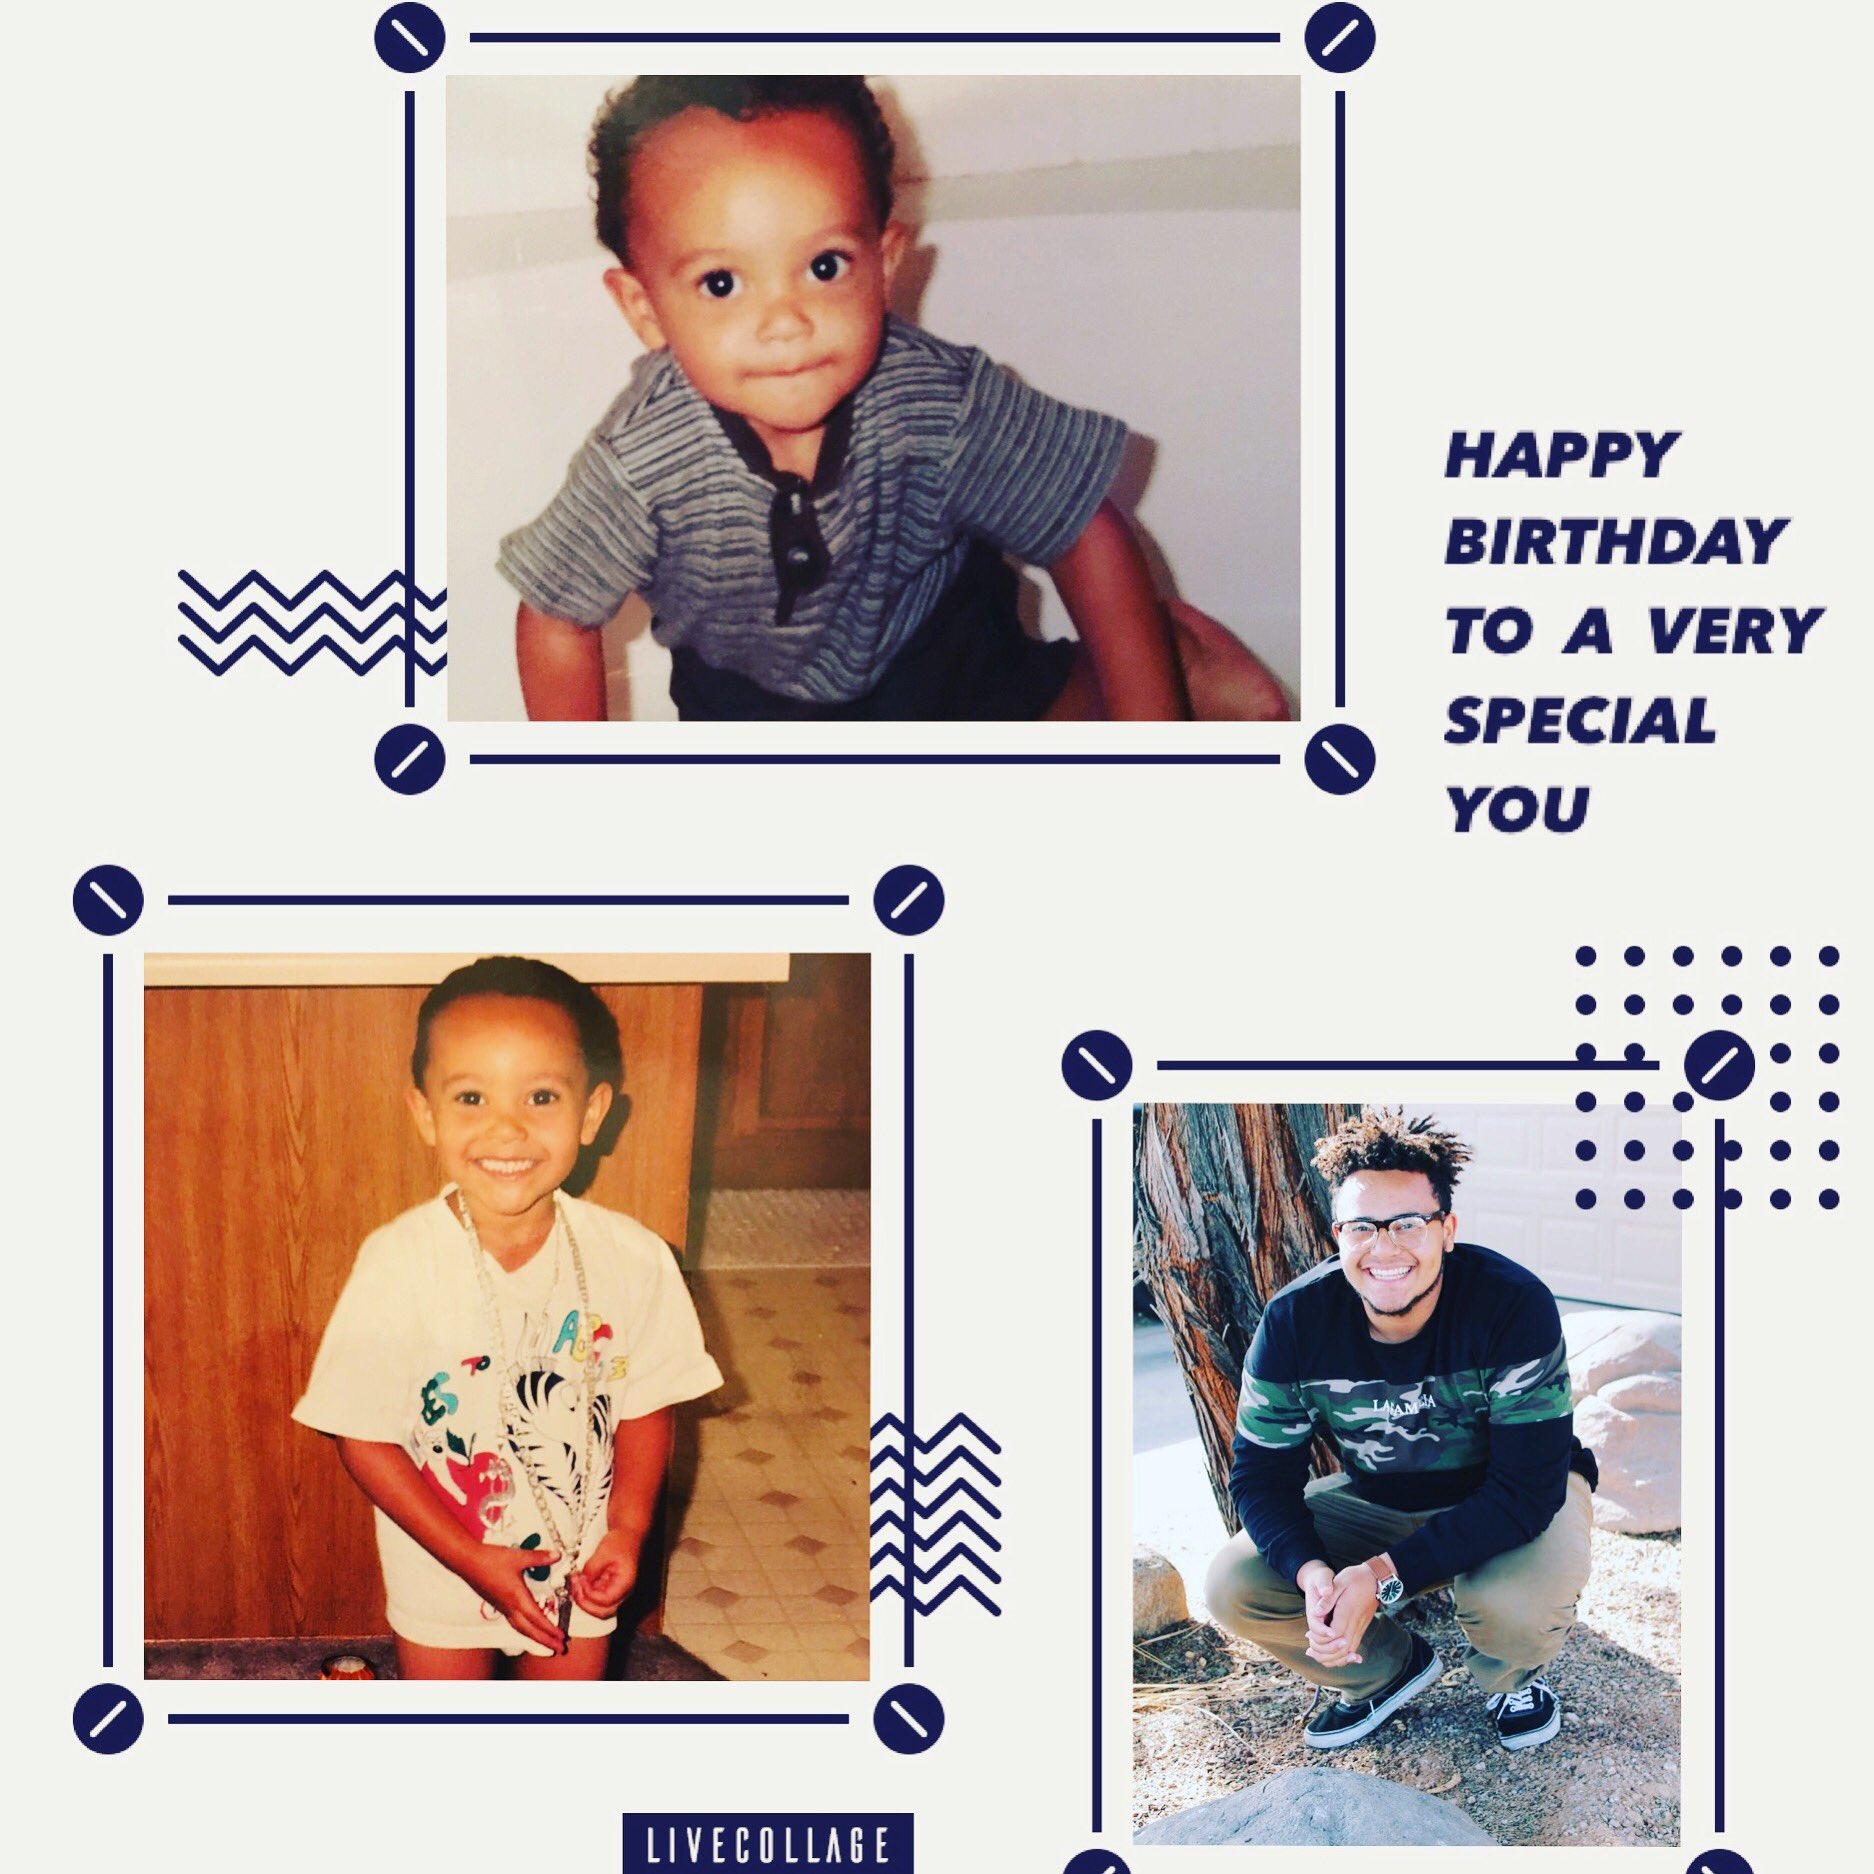 Big boy is 19 today..help me wish him happy birthday...   ..